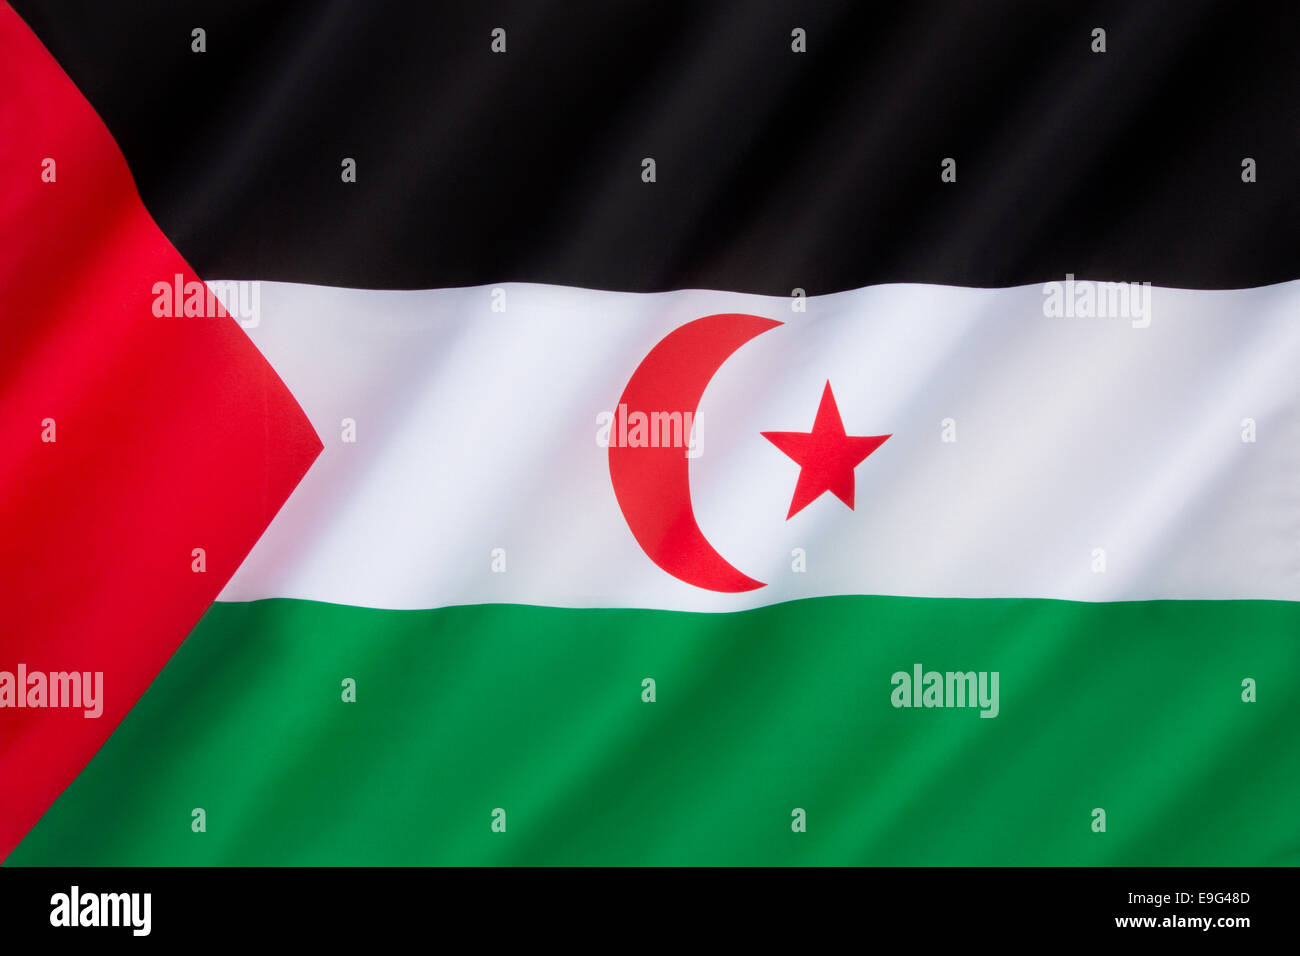 Flag of Western Sahara - Stock Image